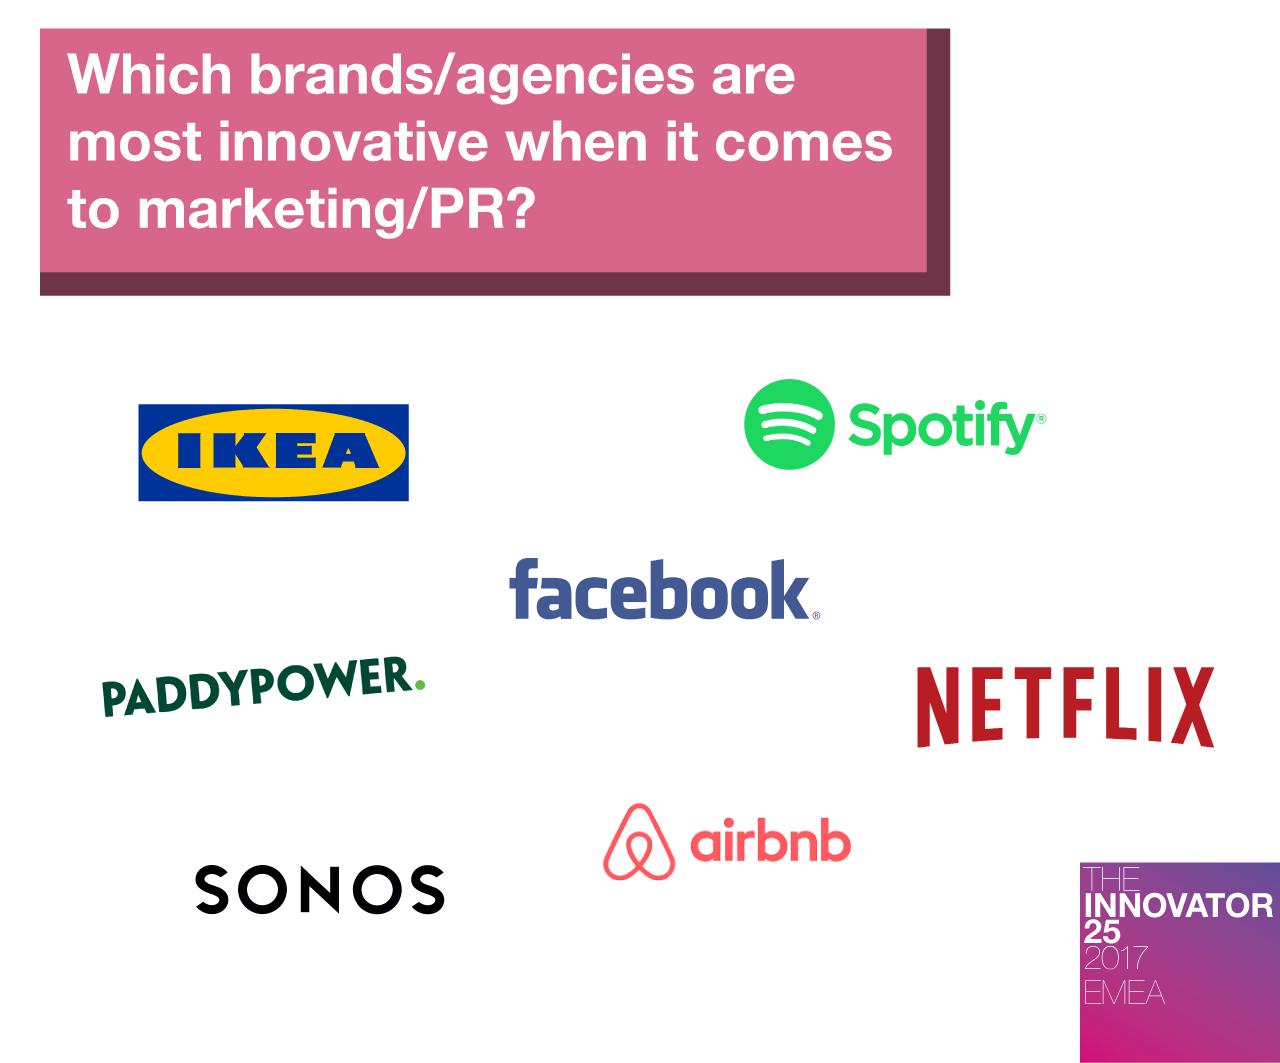 Innovator 25 EMEA - Most innovative brands